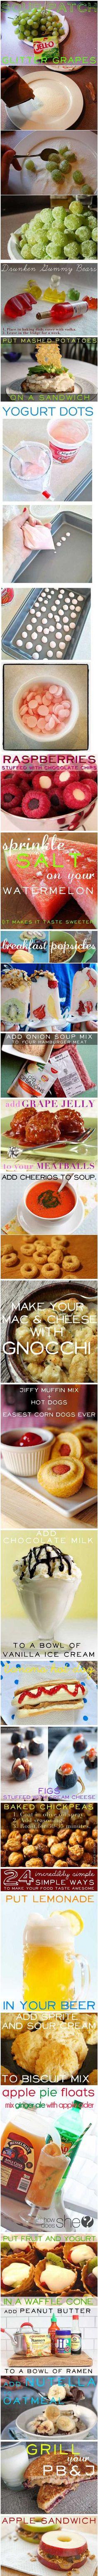 Simple Ways To Make Food Taste Awesome